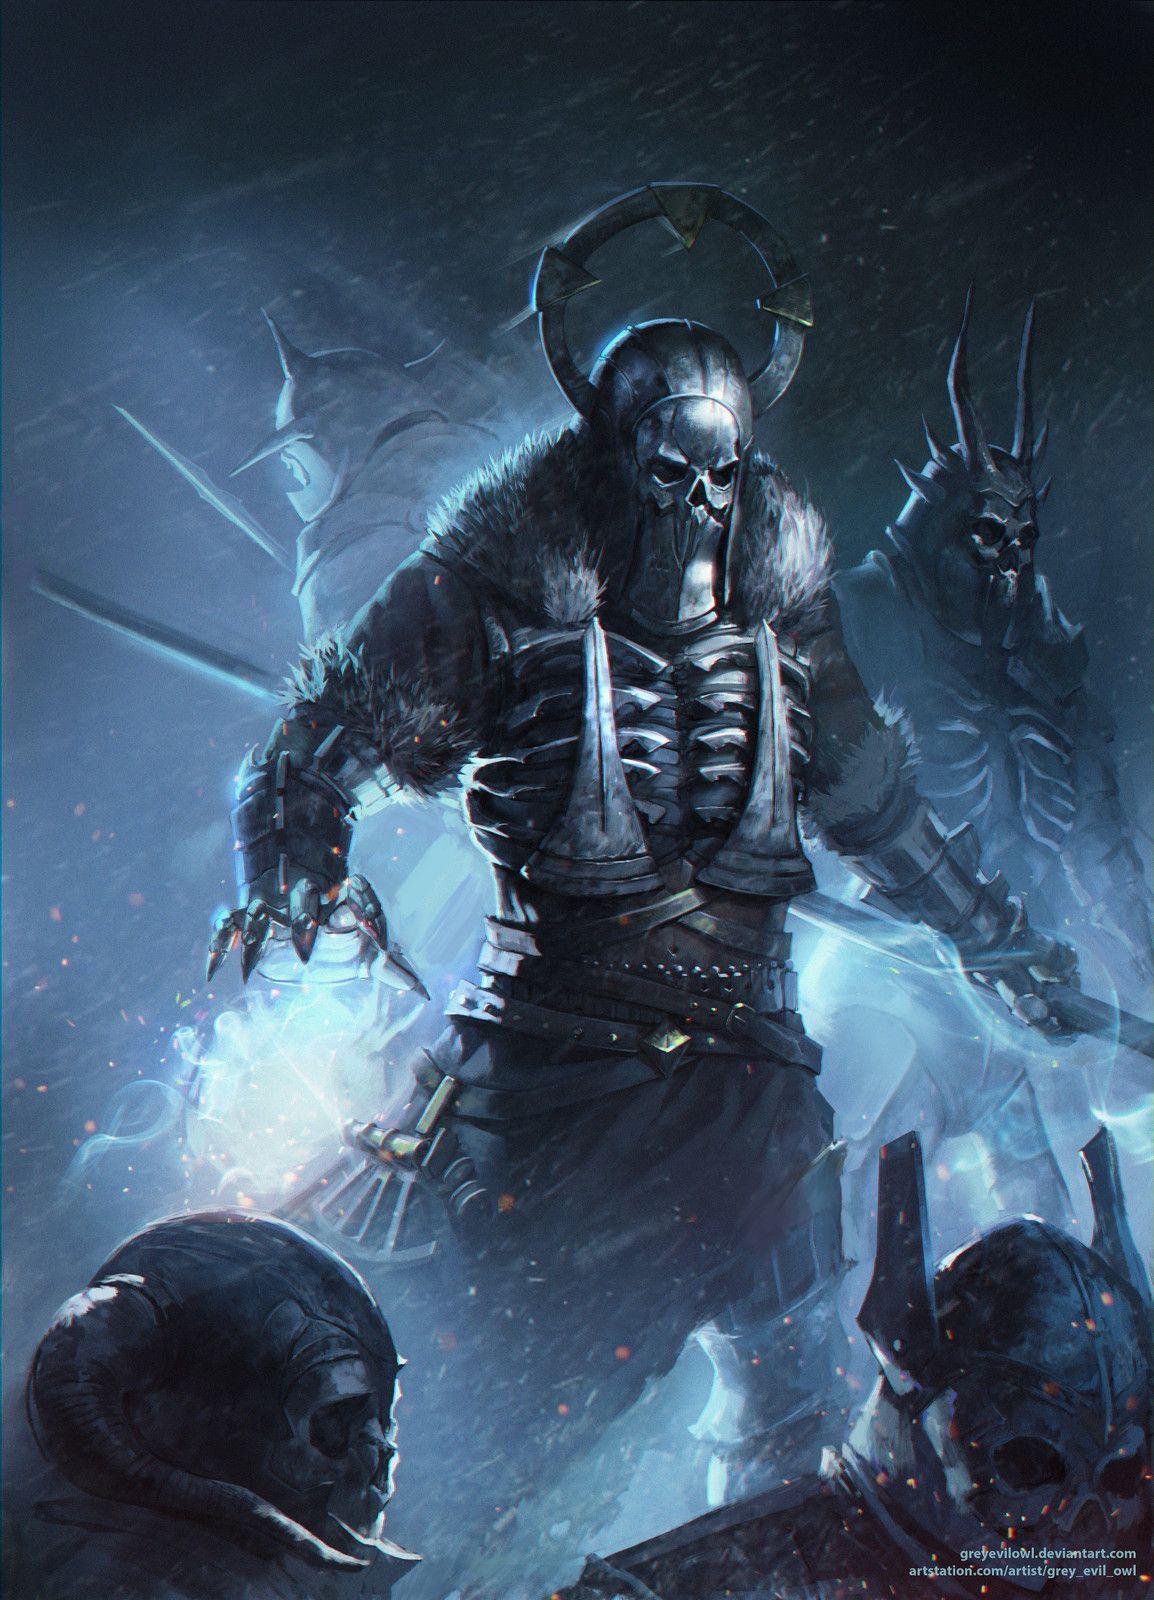 Caranthir witcher 3 fanart owl grey evil on artstation - The witcher 3 caranthir ...